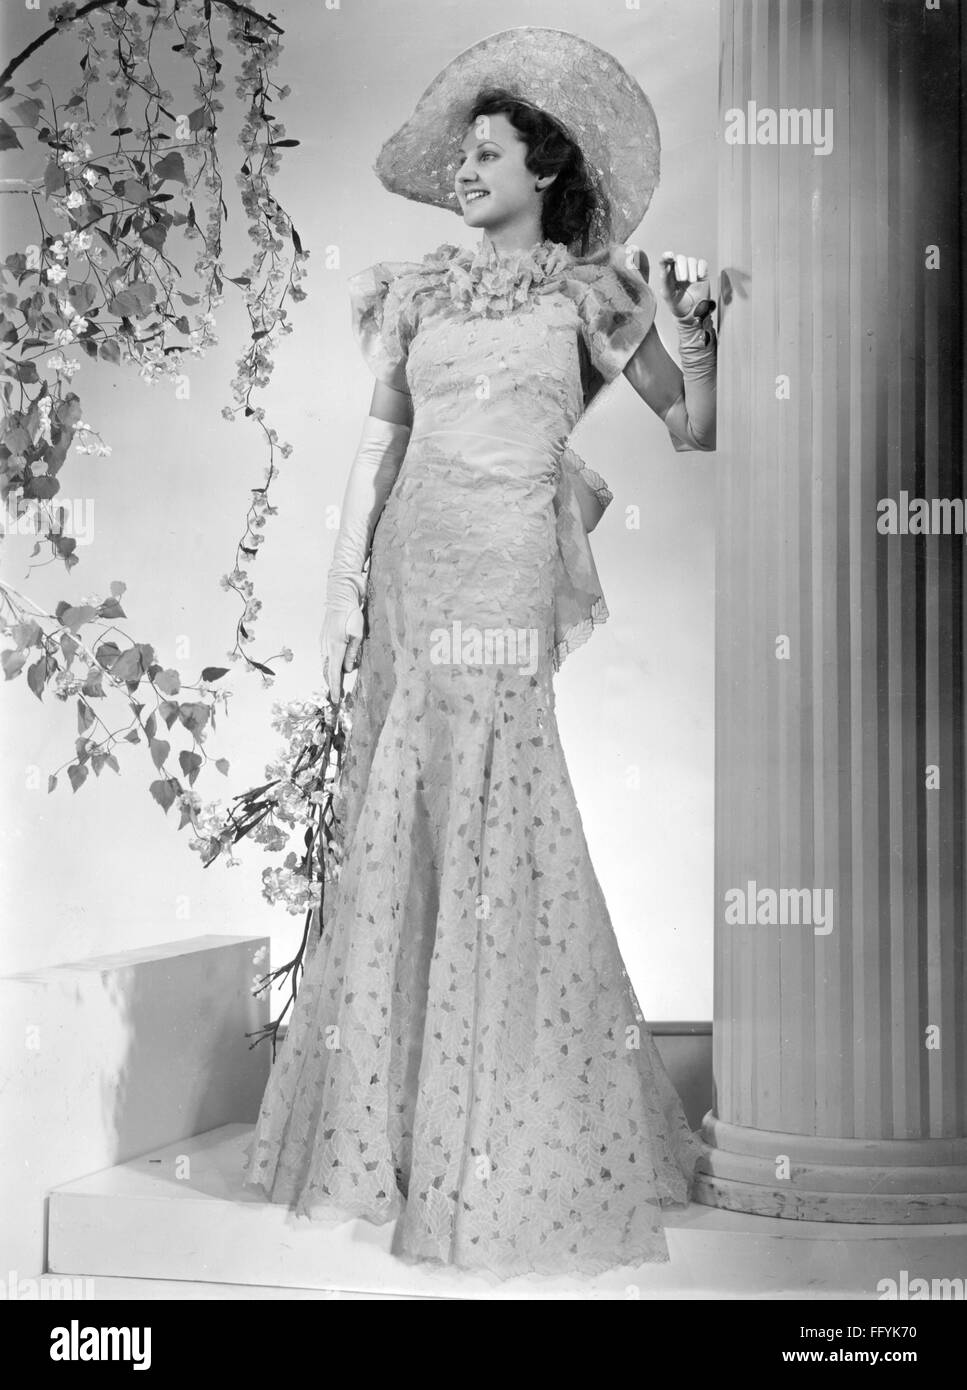 Fashion Inspirationtv recap revenge and nashville, Dresses Wedding short pictures